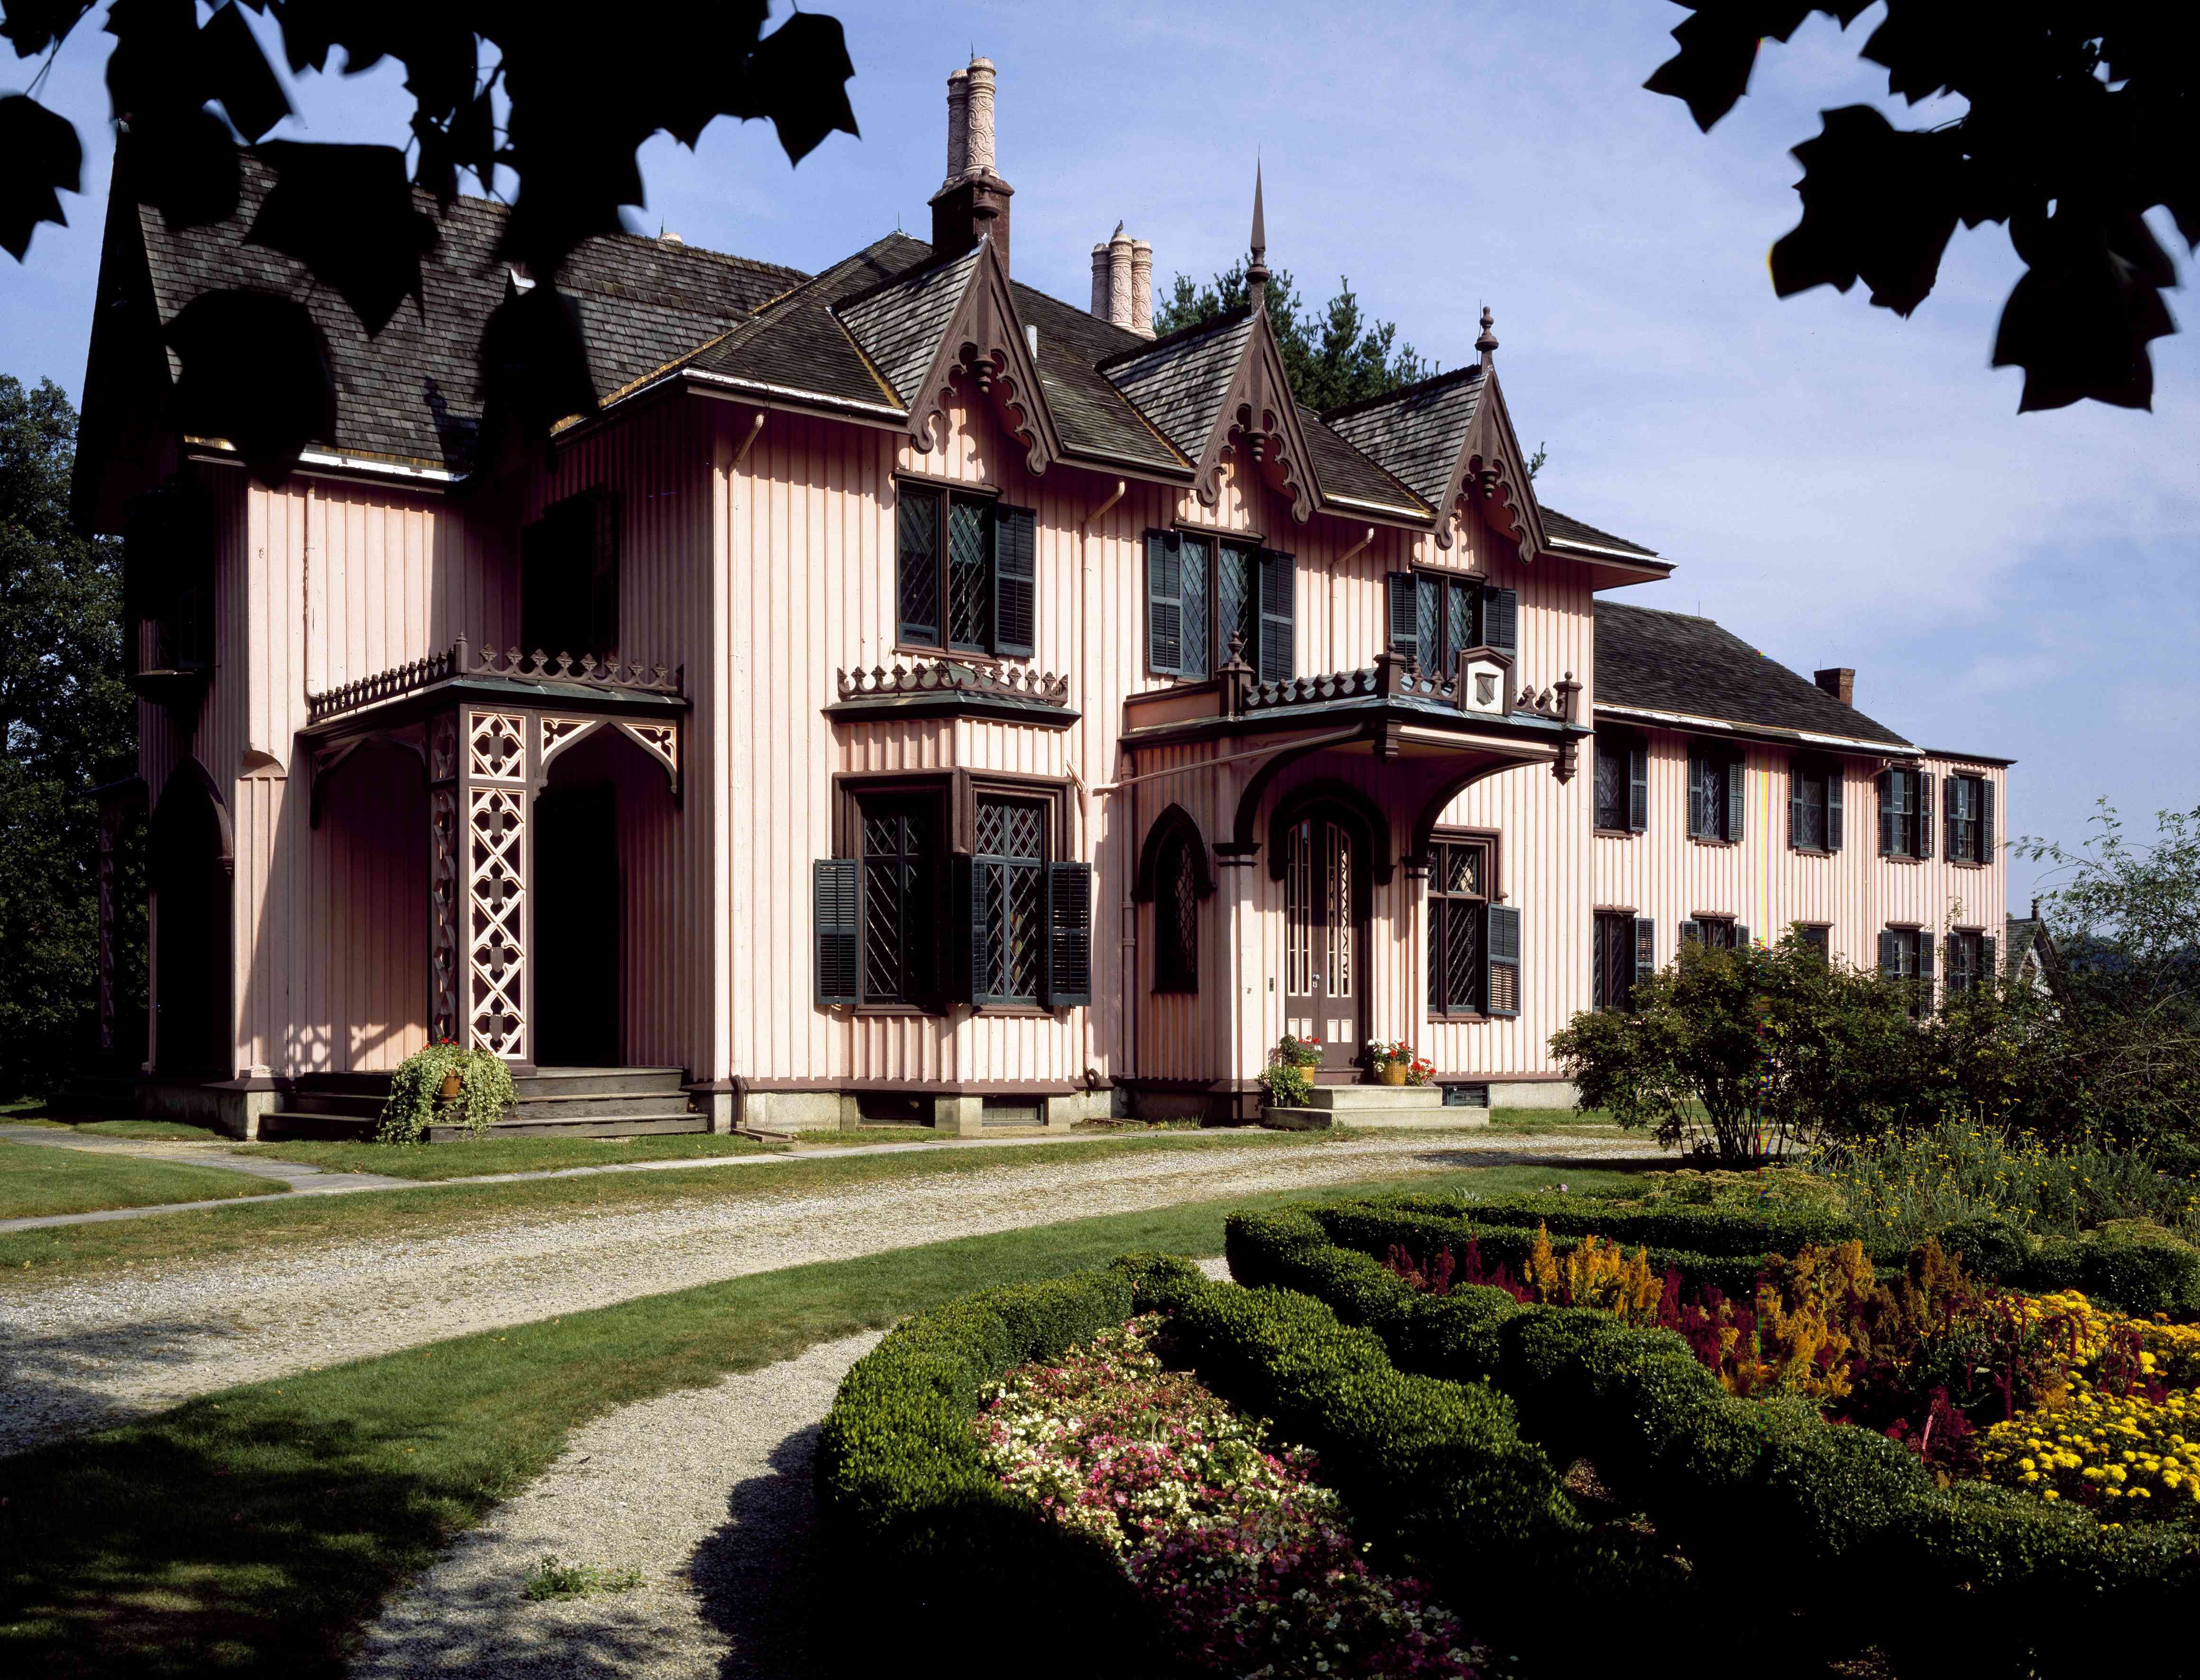 Roseland Cottage, Woodstock, Connecticut